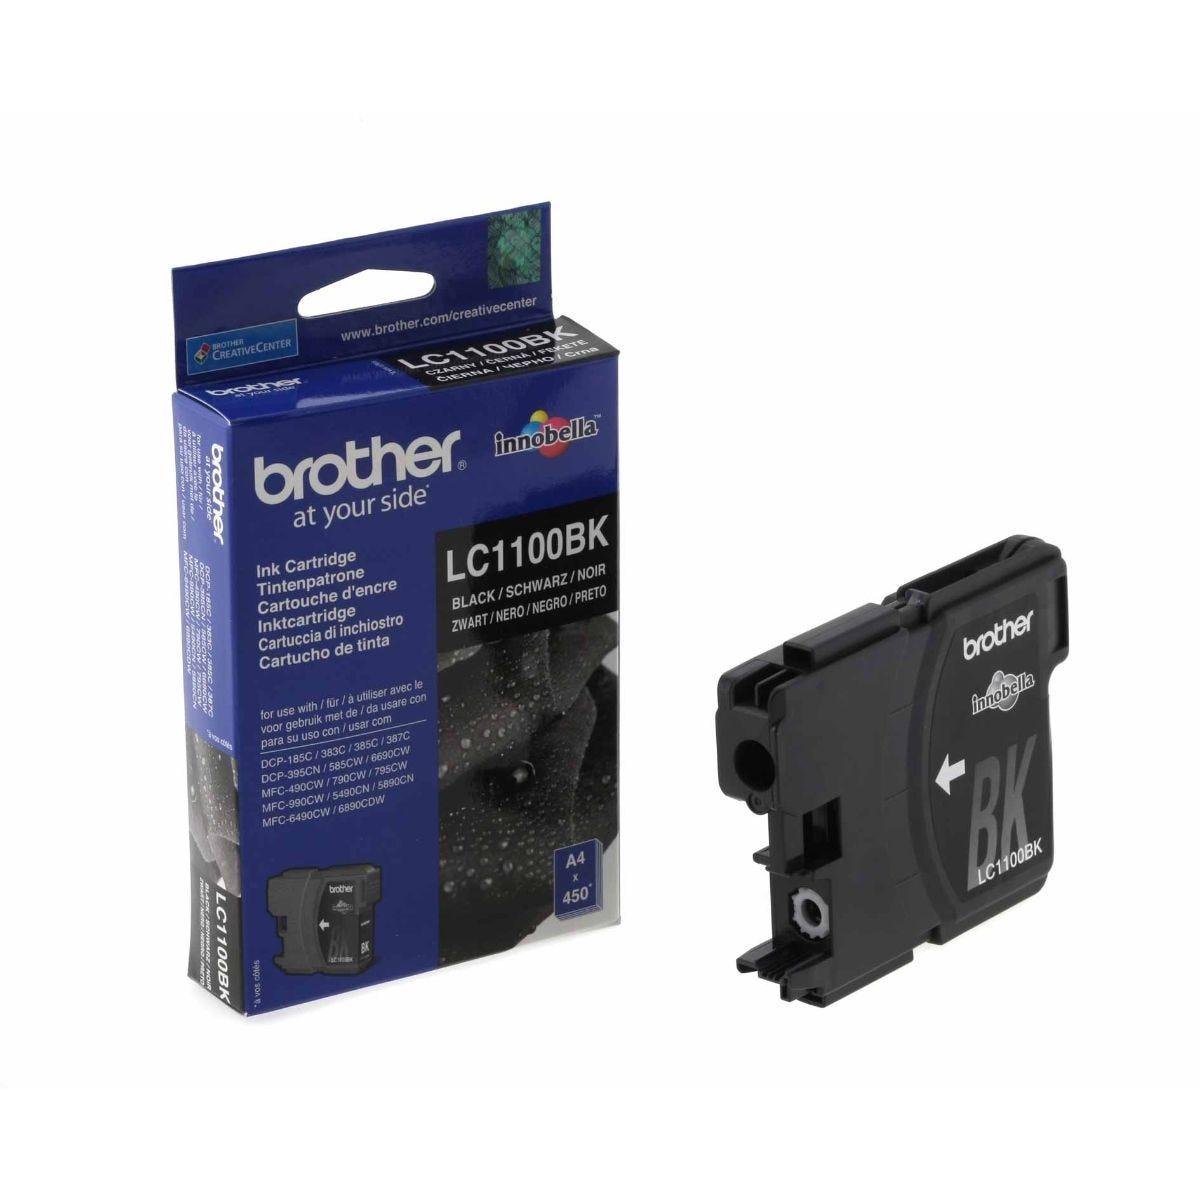 Image of Brother LC1100BK Ink Cartridge, Black